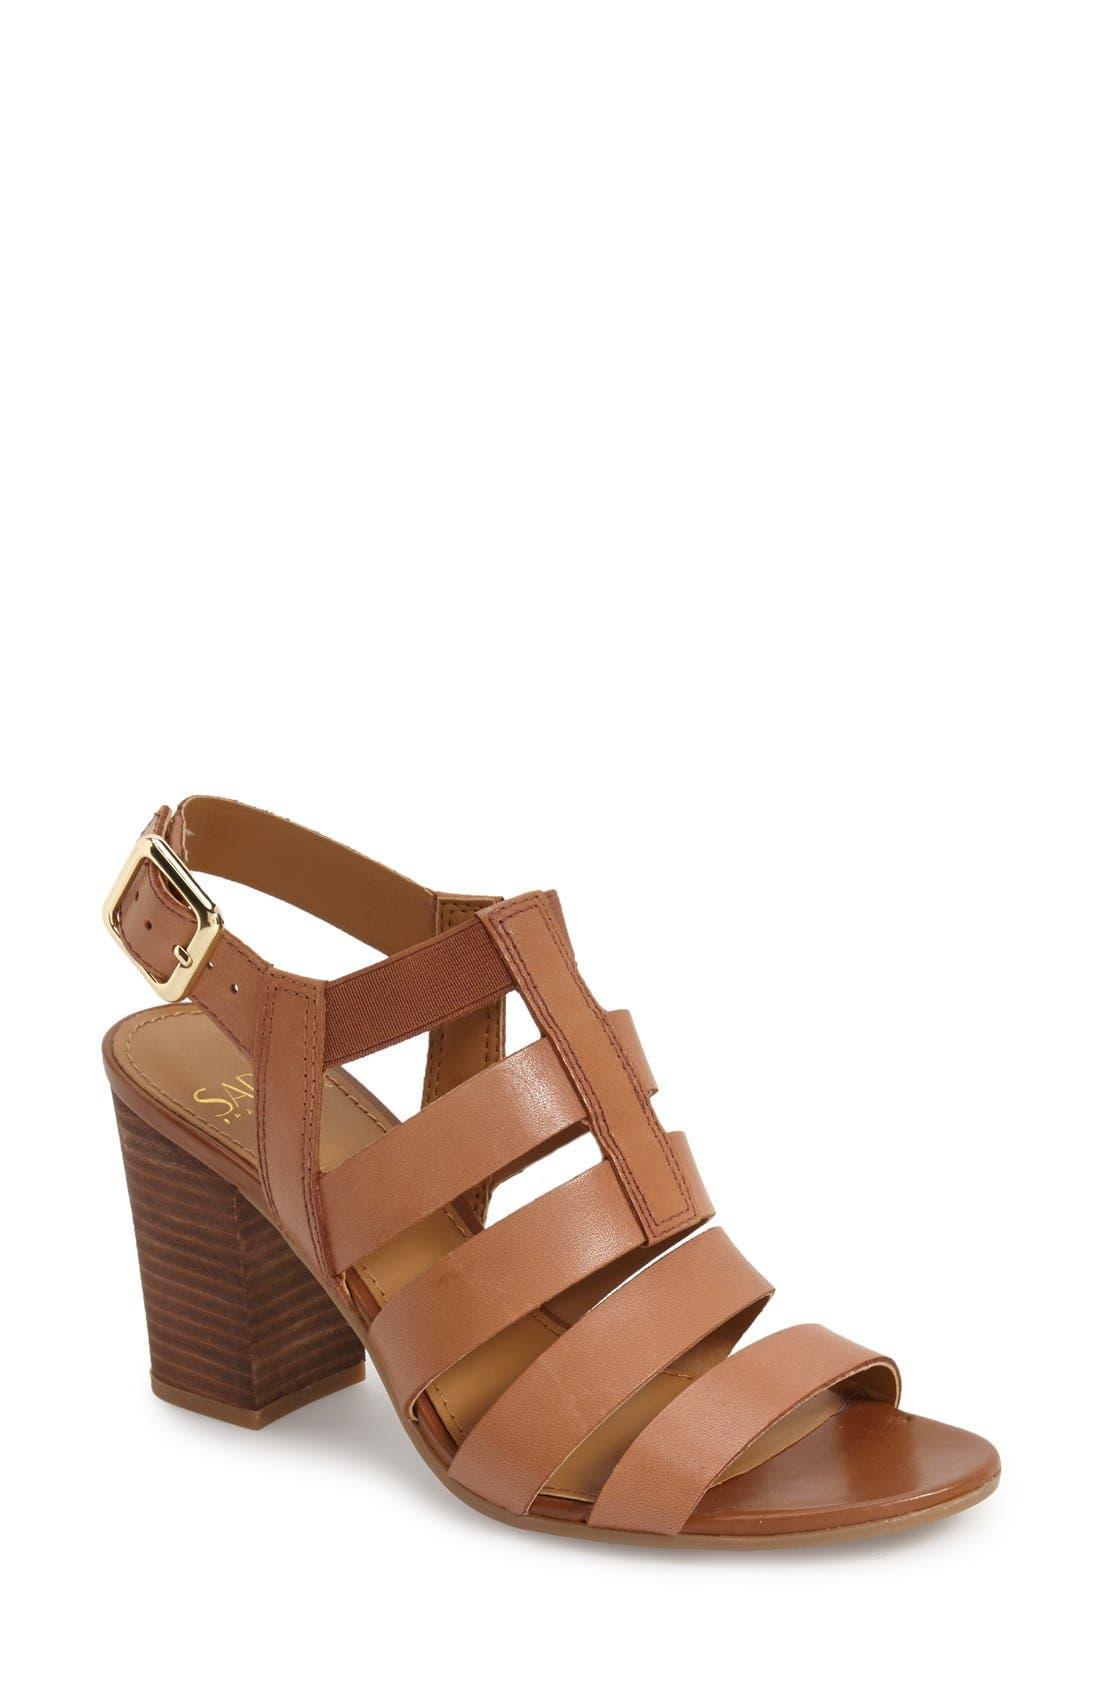 Alternate Image 1 Selected - Franco Sarto 'Montage' Leather Sandal (Women)